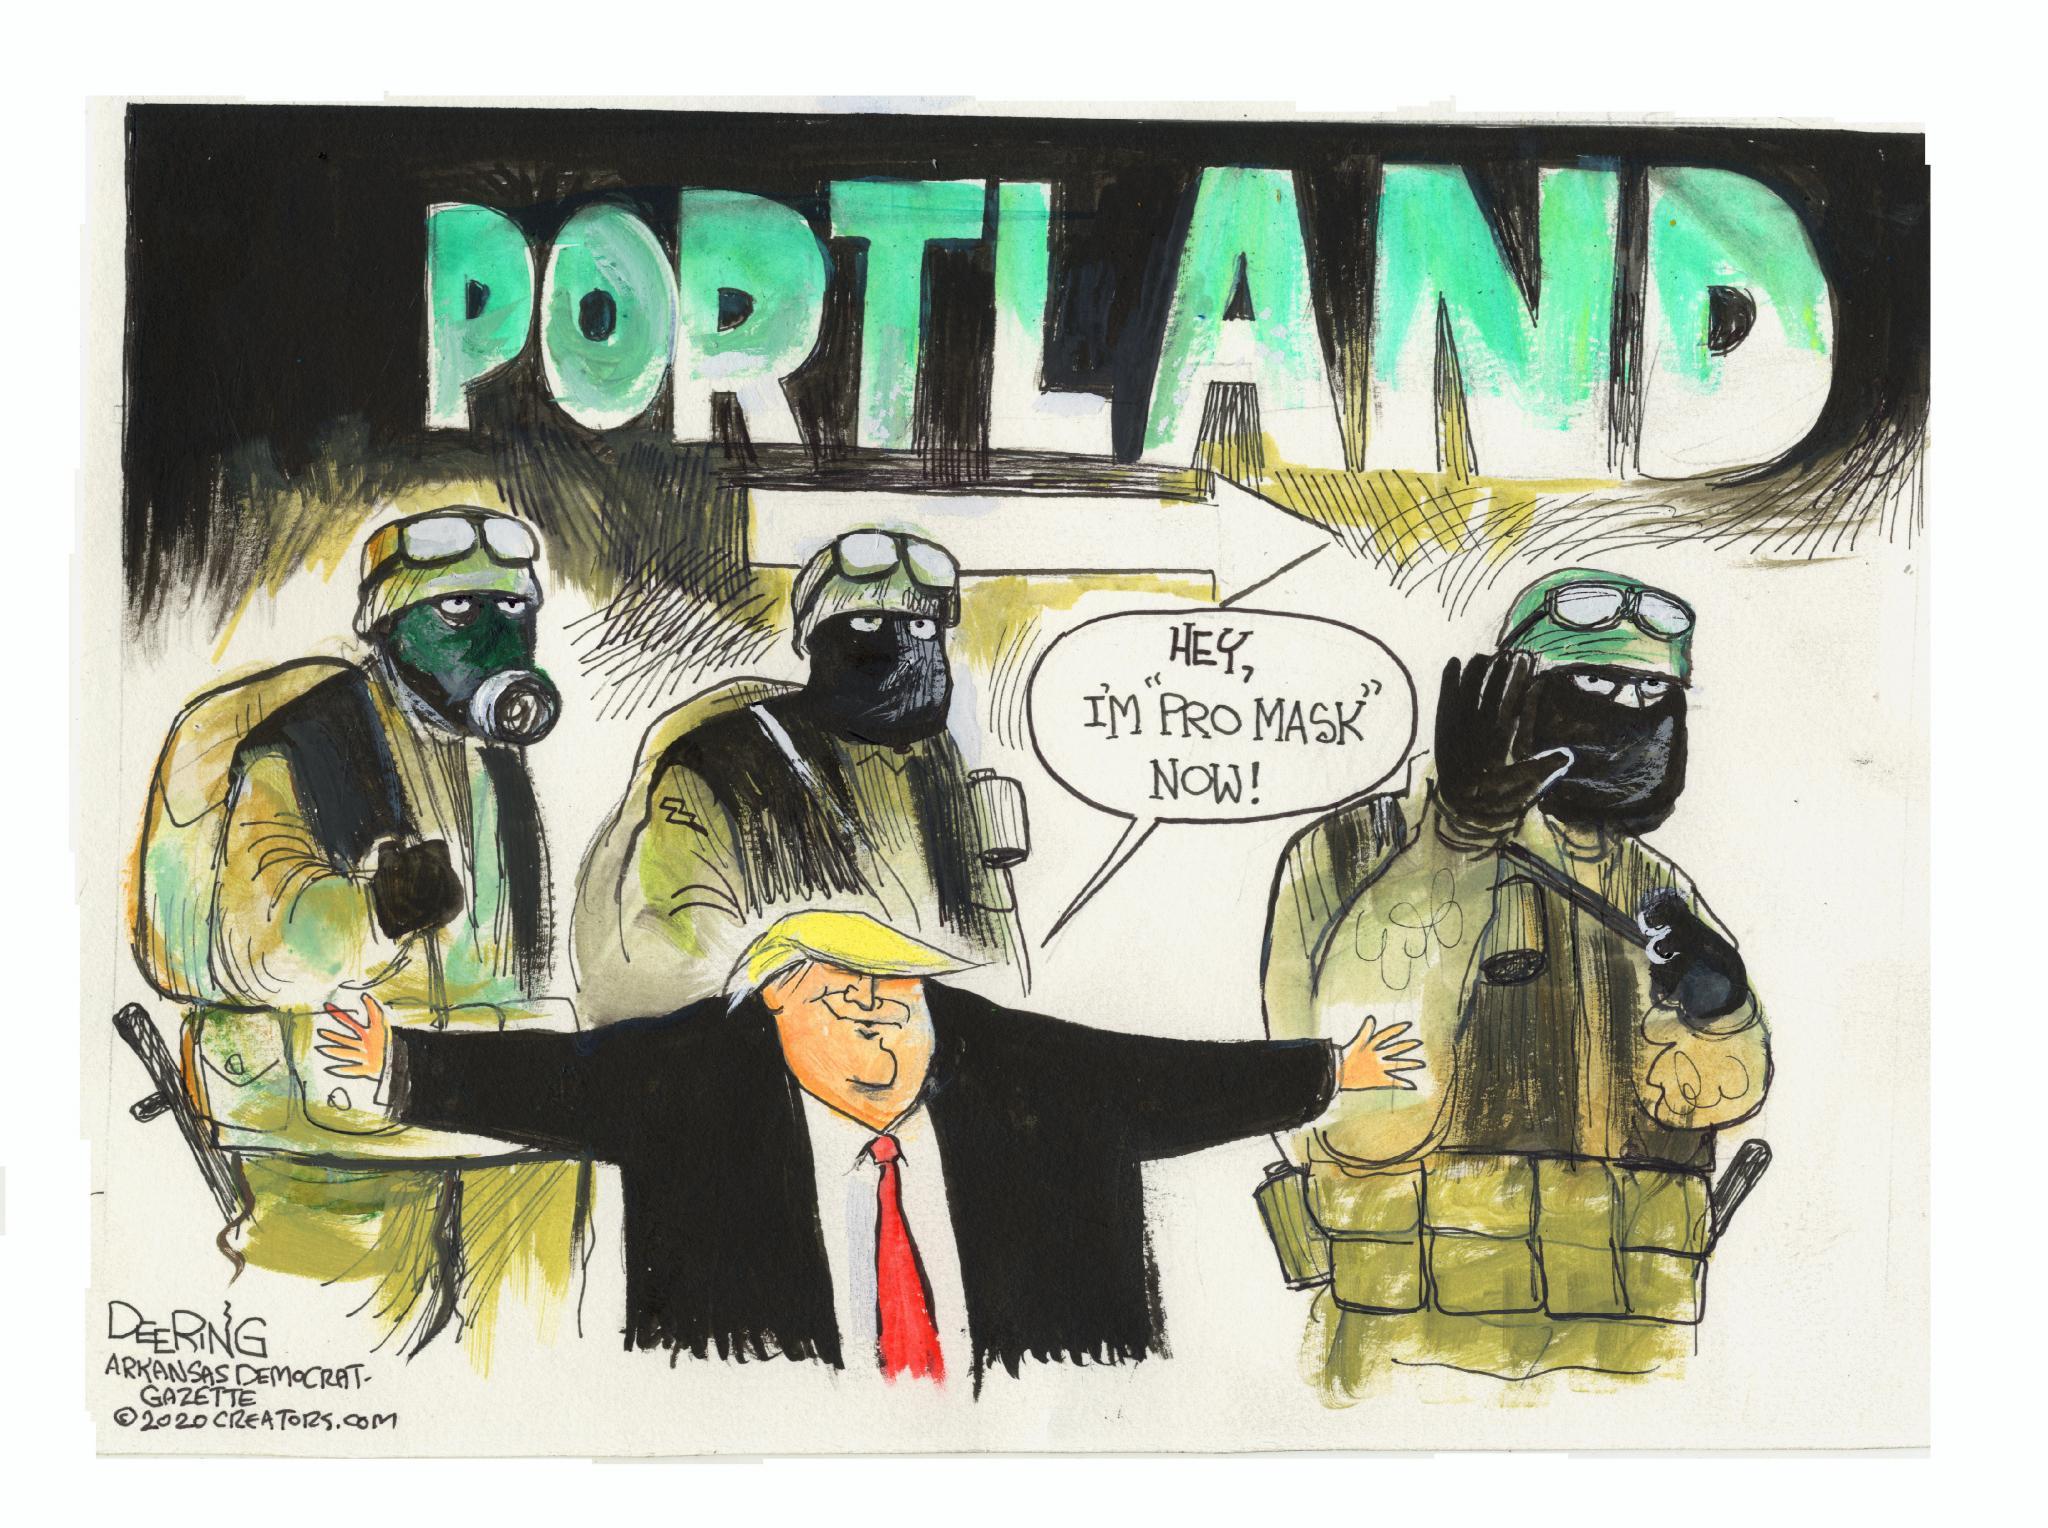 Political cartoons - the 'funny' pics thread.-jd072220dapr-jpg